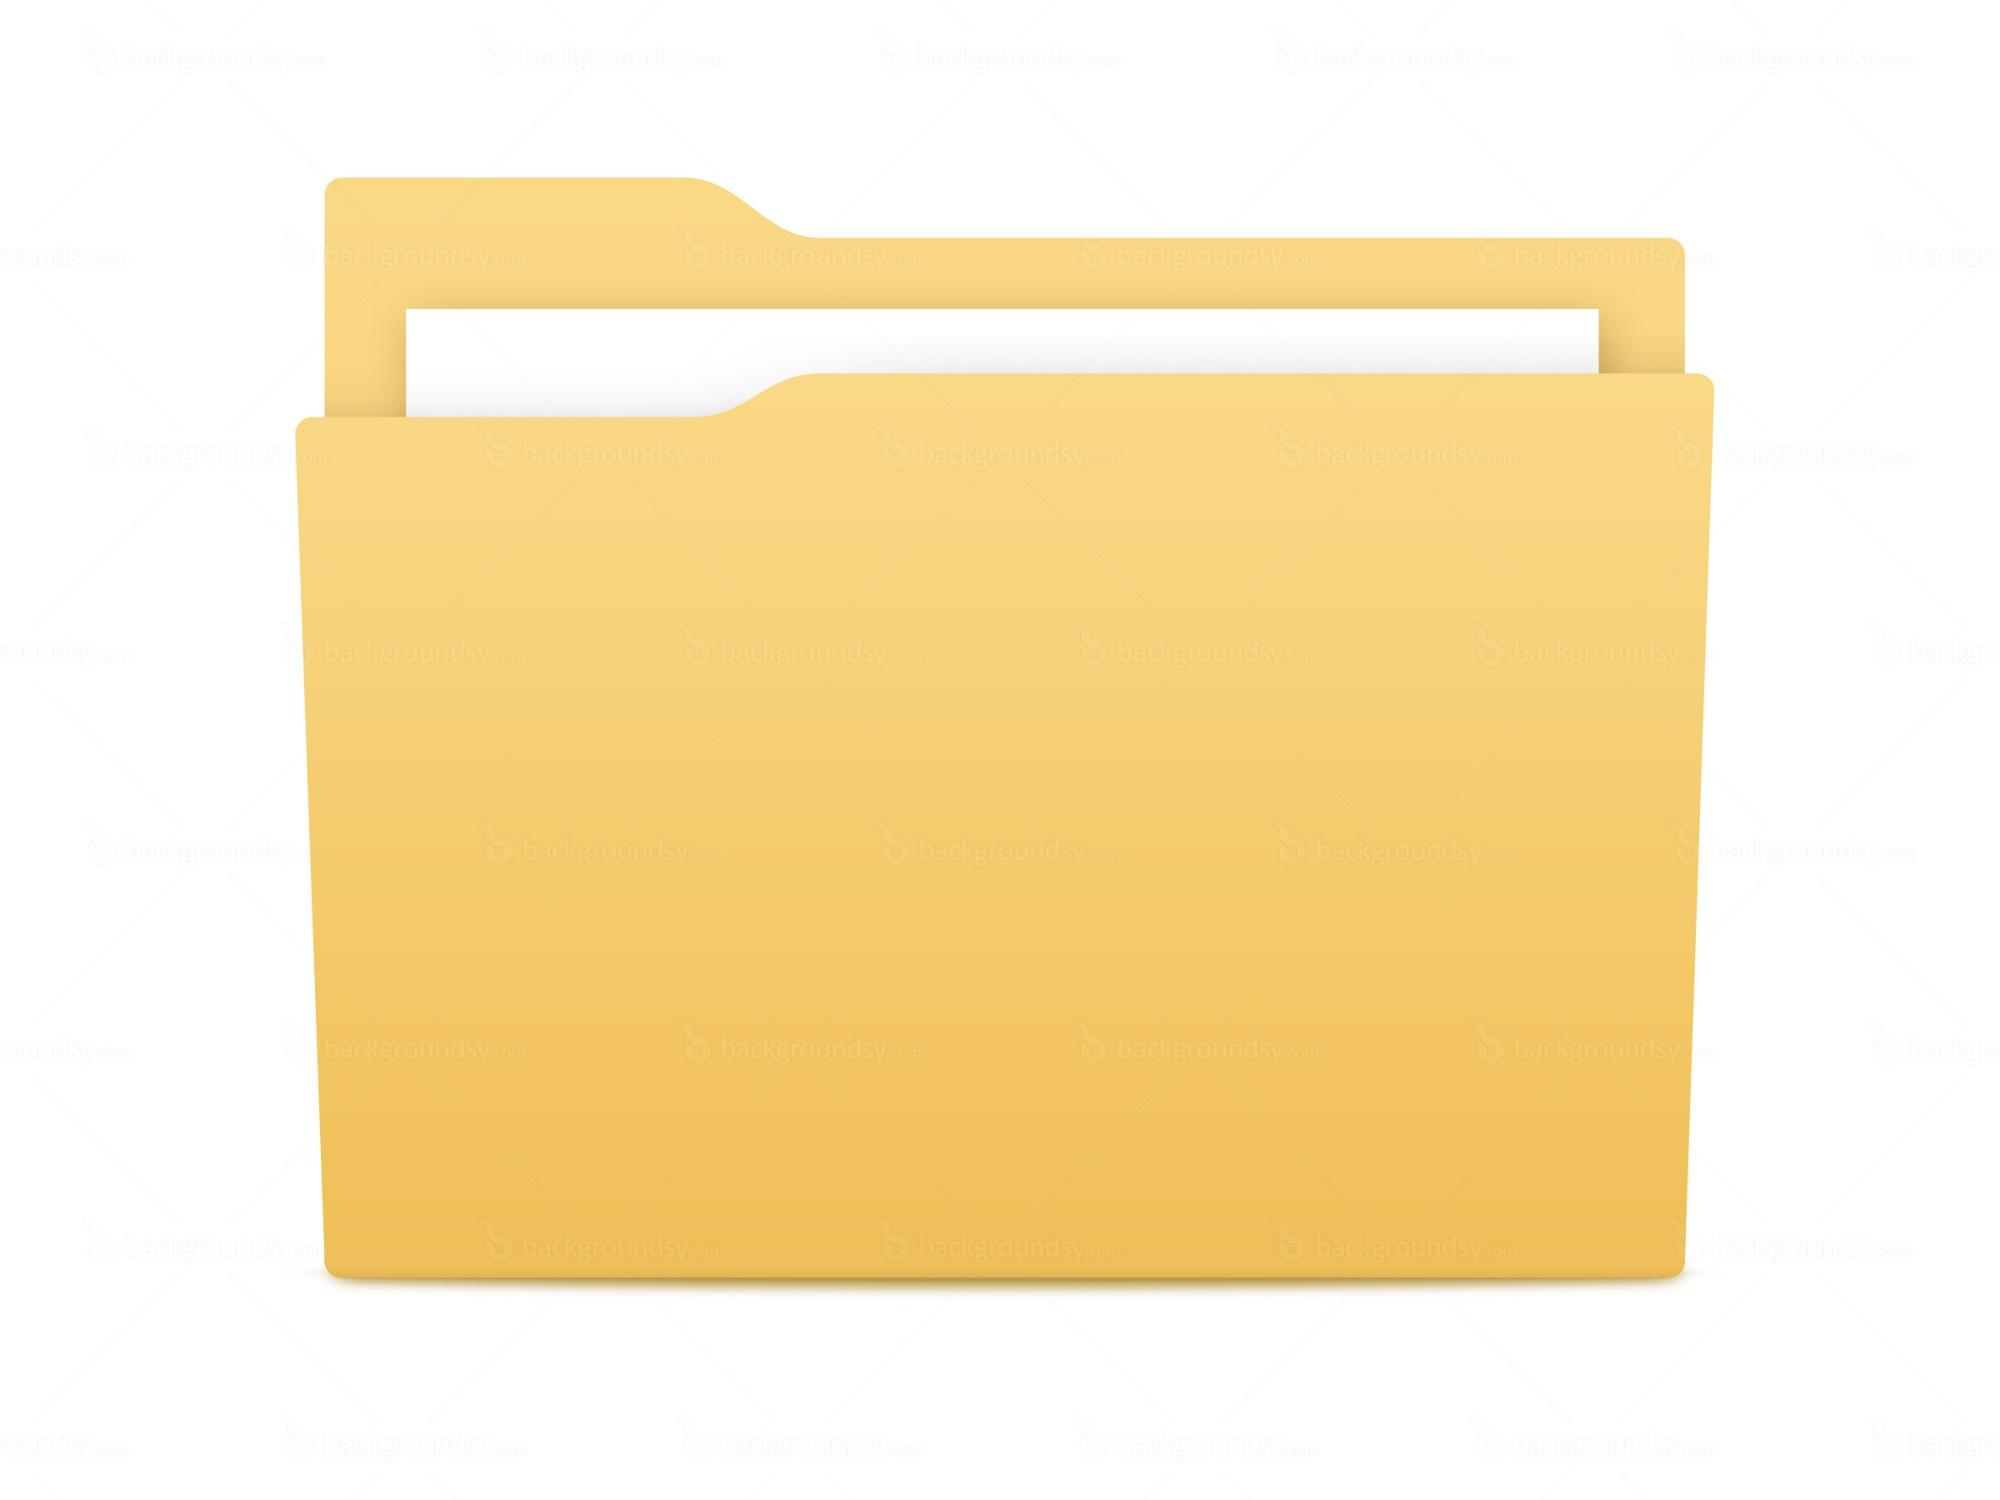 Yellow Folder Icon Psd Backgroundsy Com